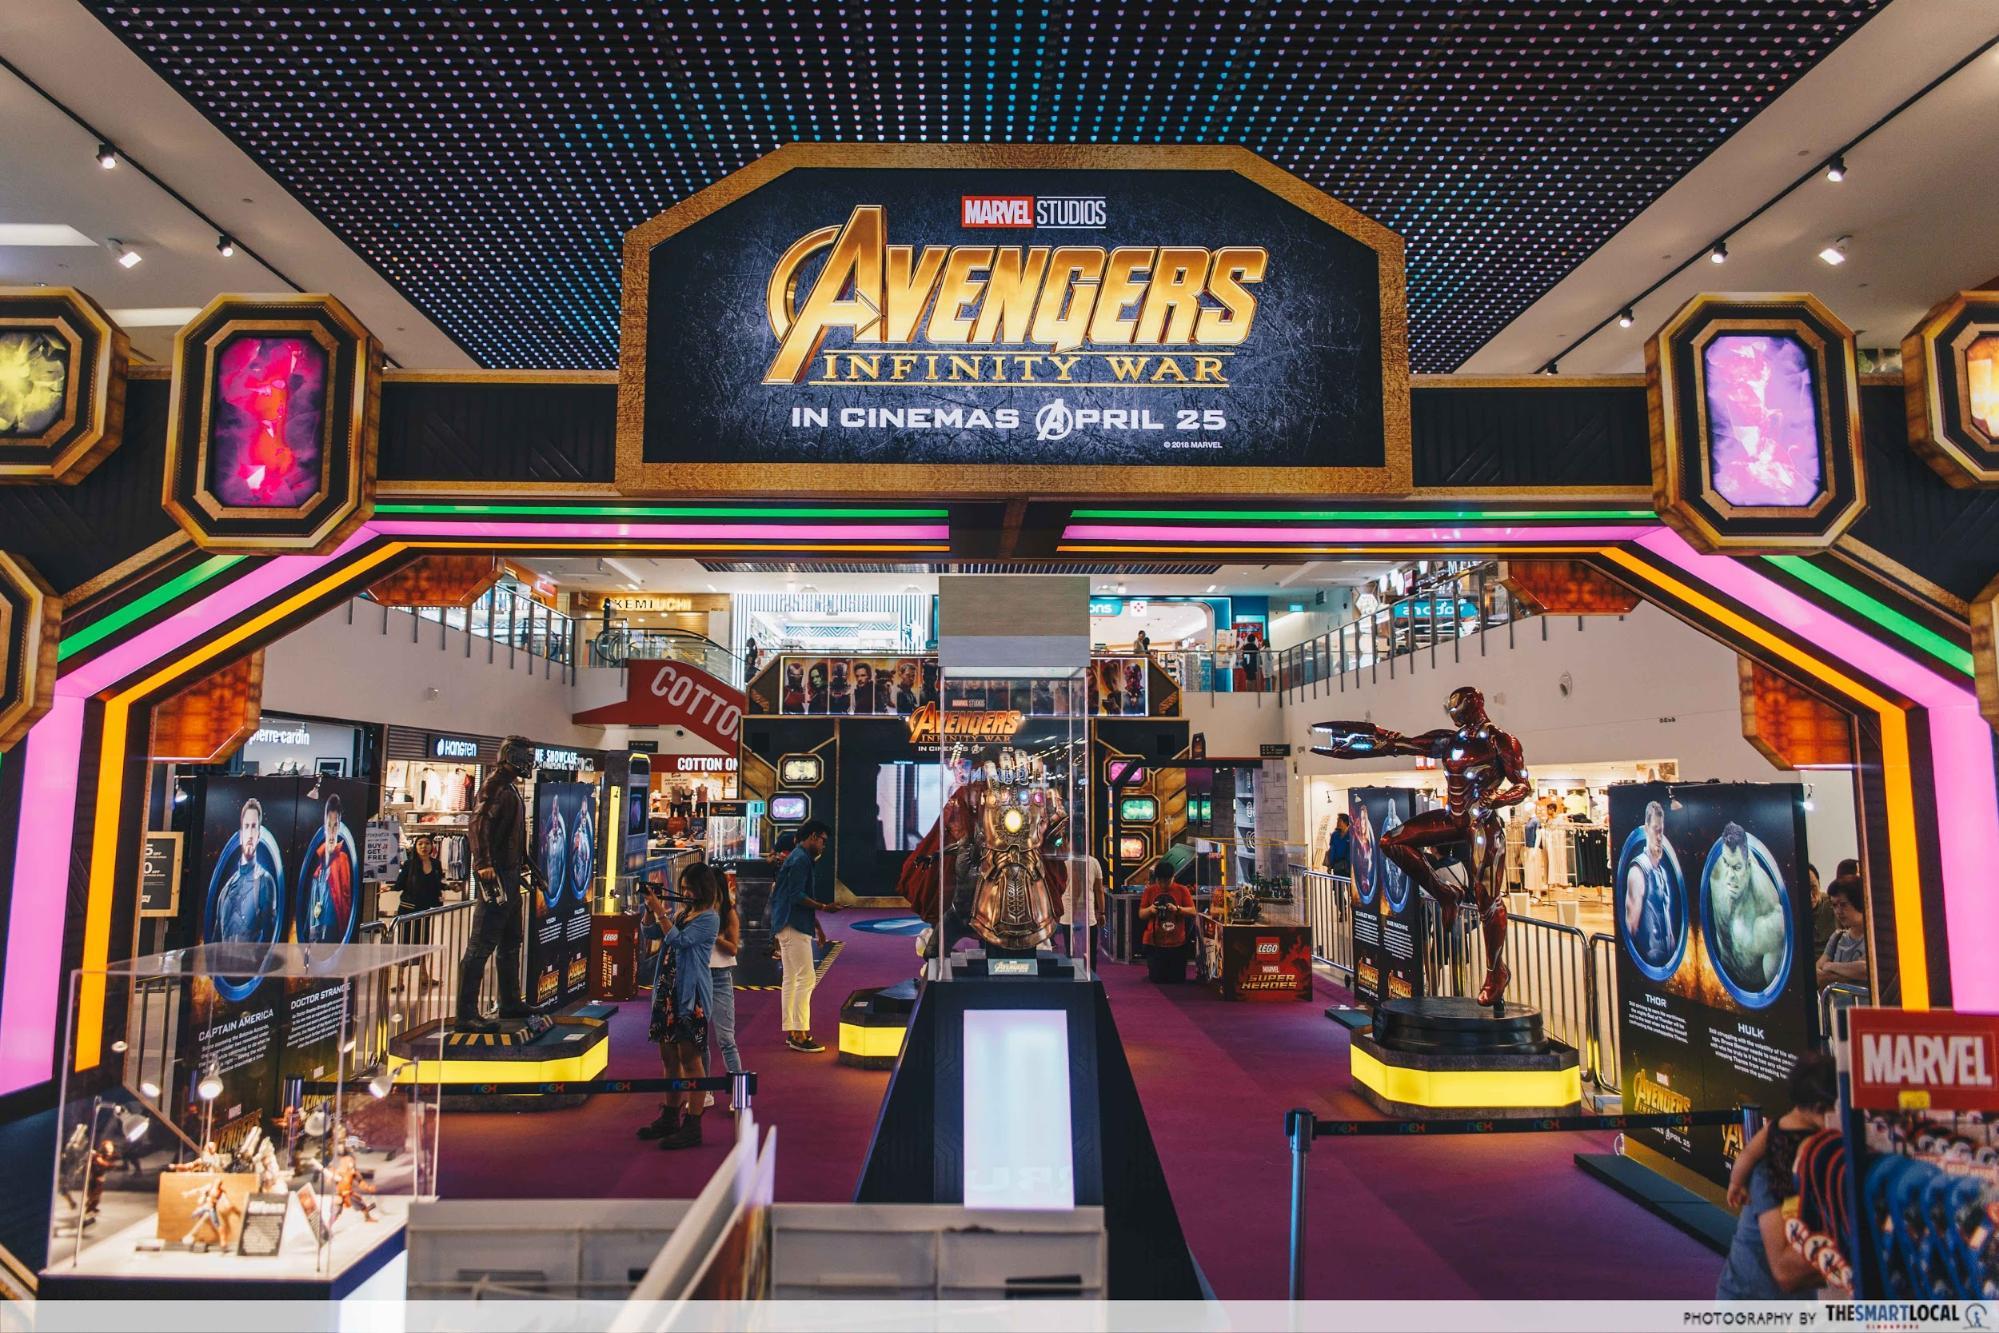 Nex Avengers - Avengers Event Facade